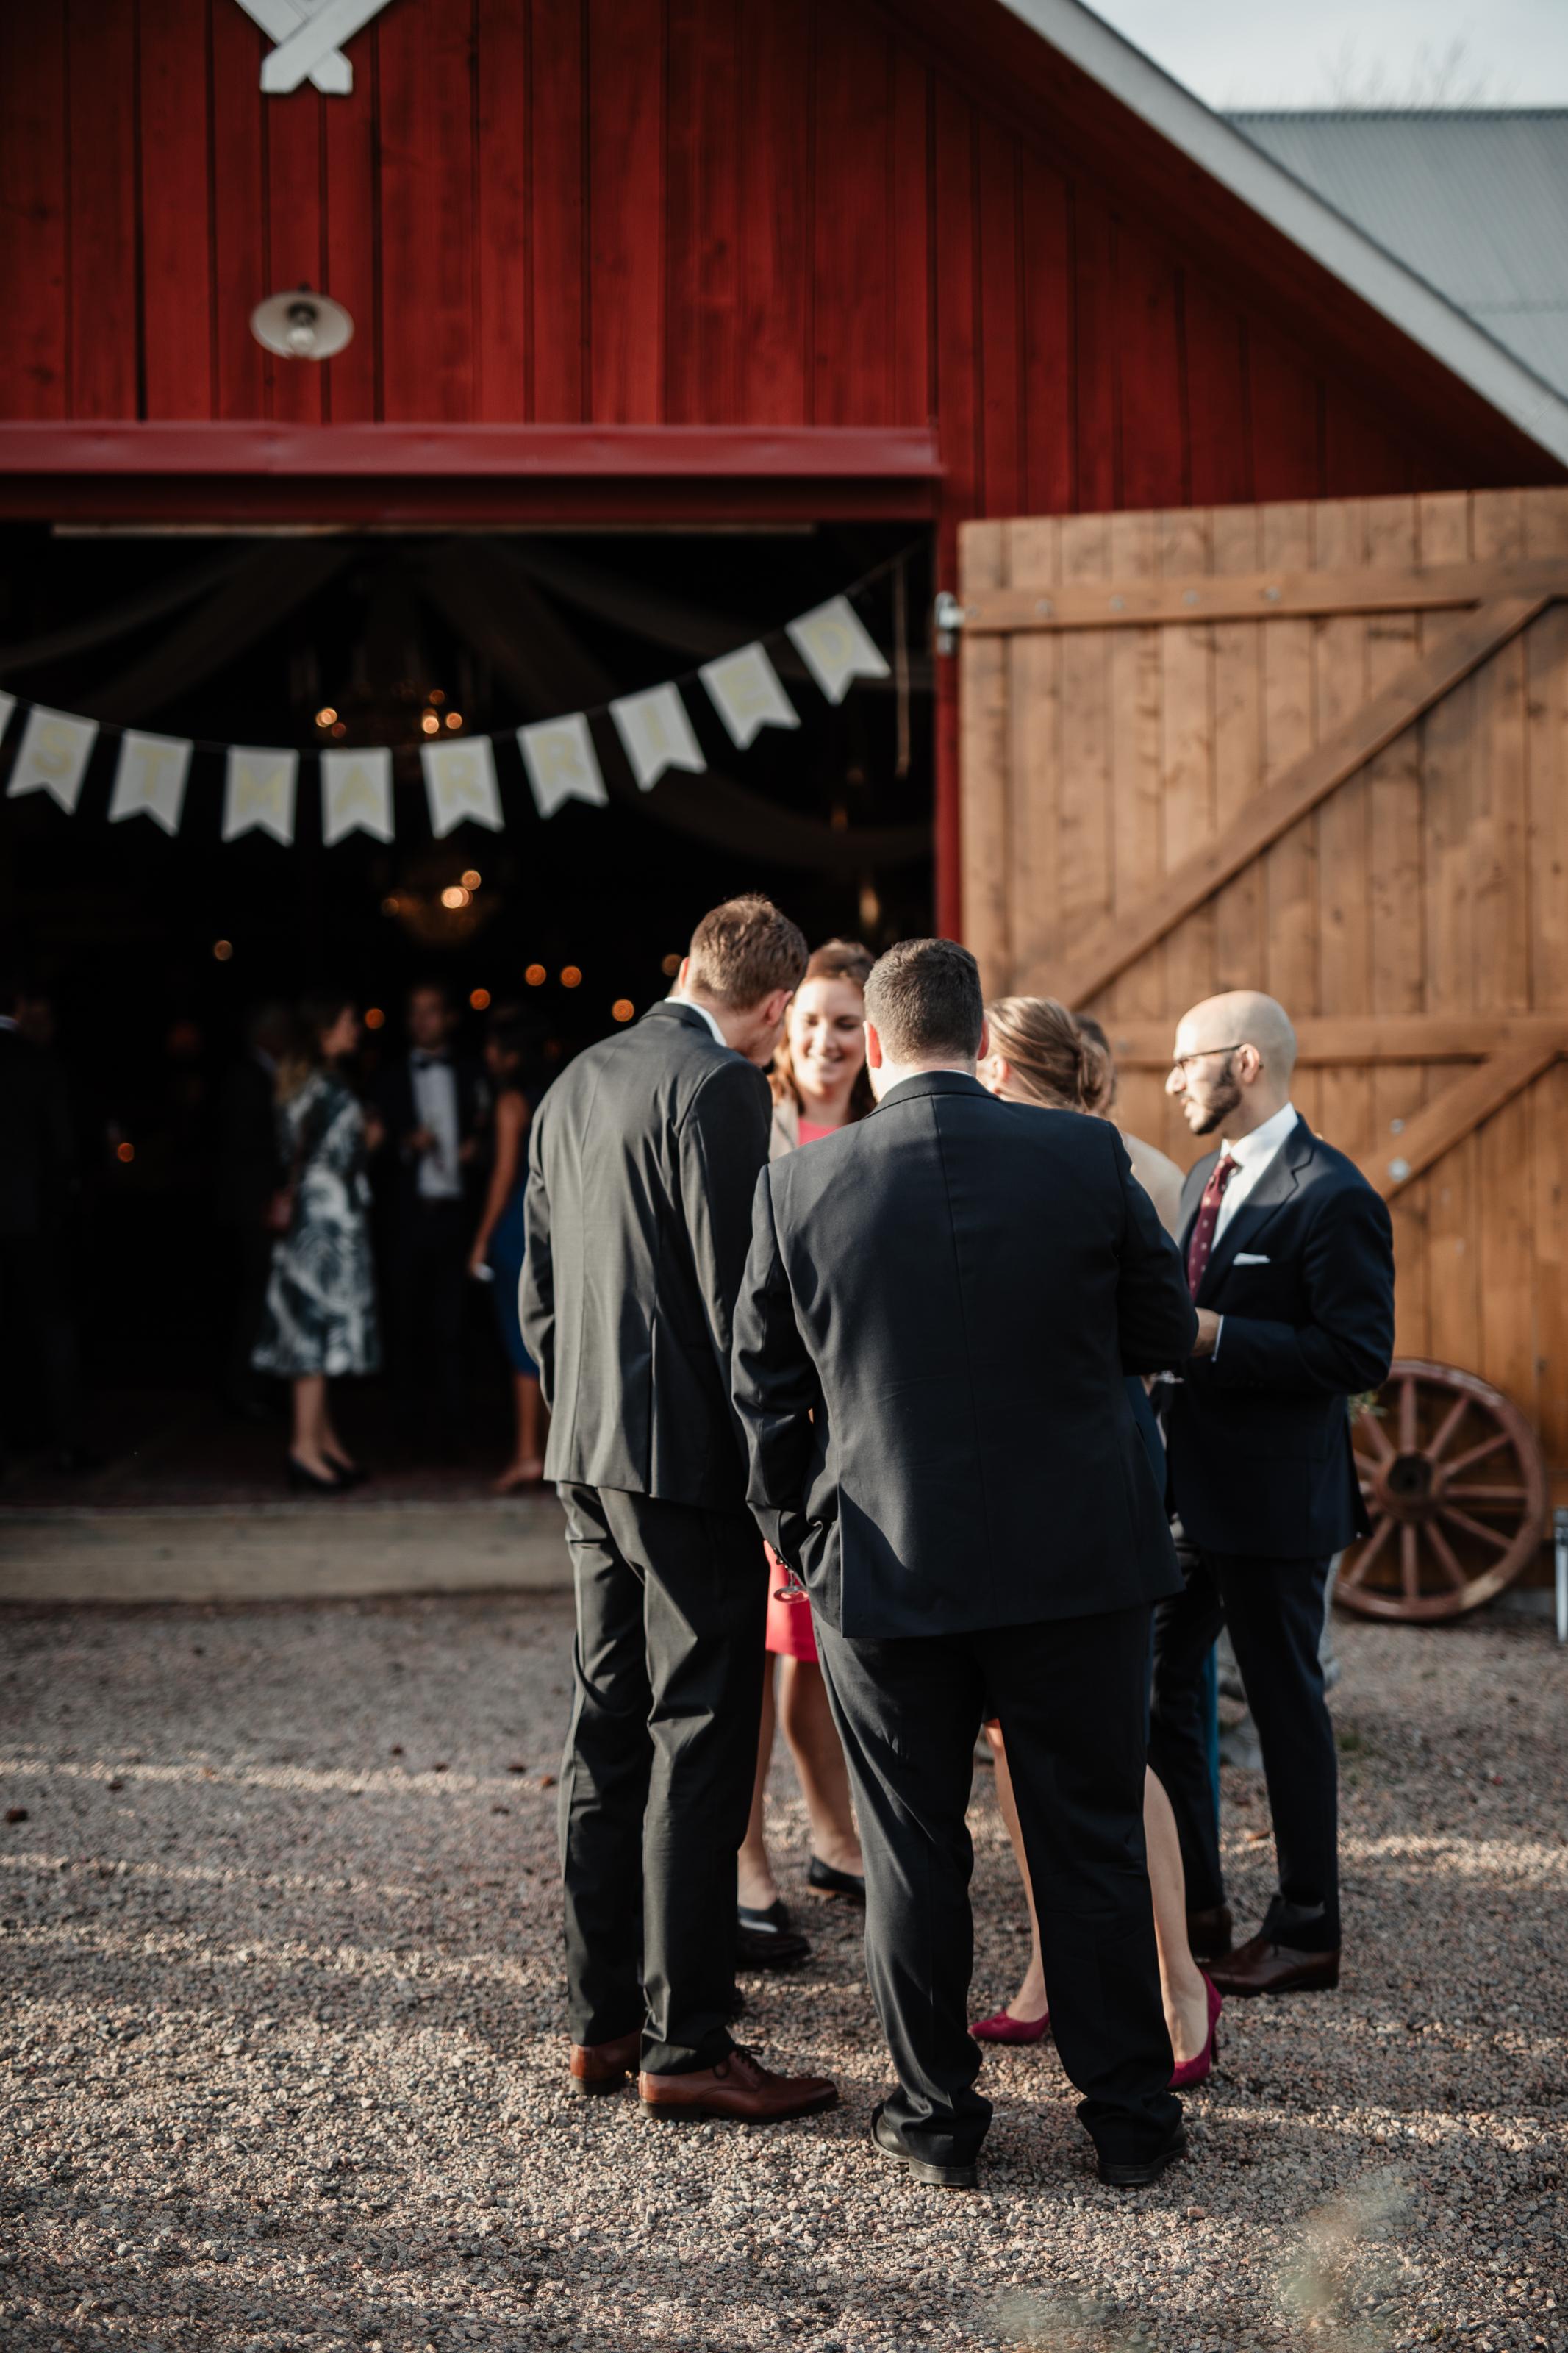 Bröllopsfotograf-Uddetorp Säteri-Höstbröllop-Fotograf Emilia- Bröllopsfotograf Borås-52.jpg